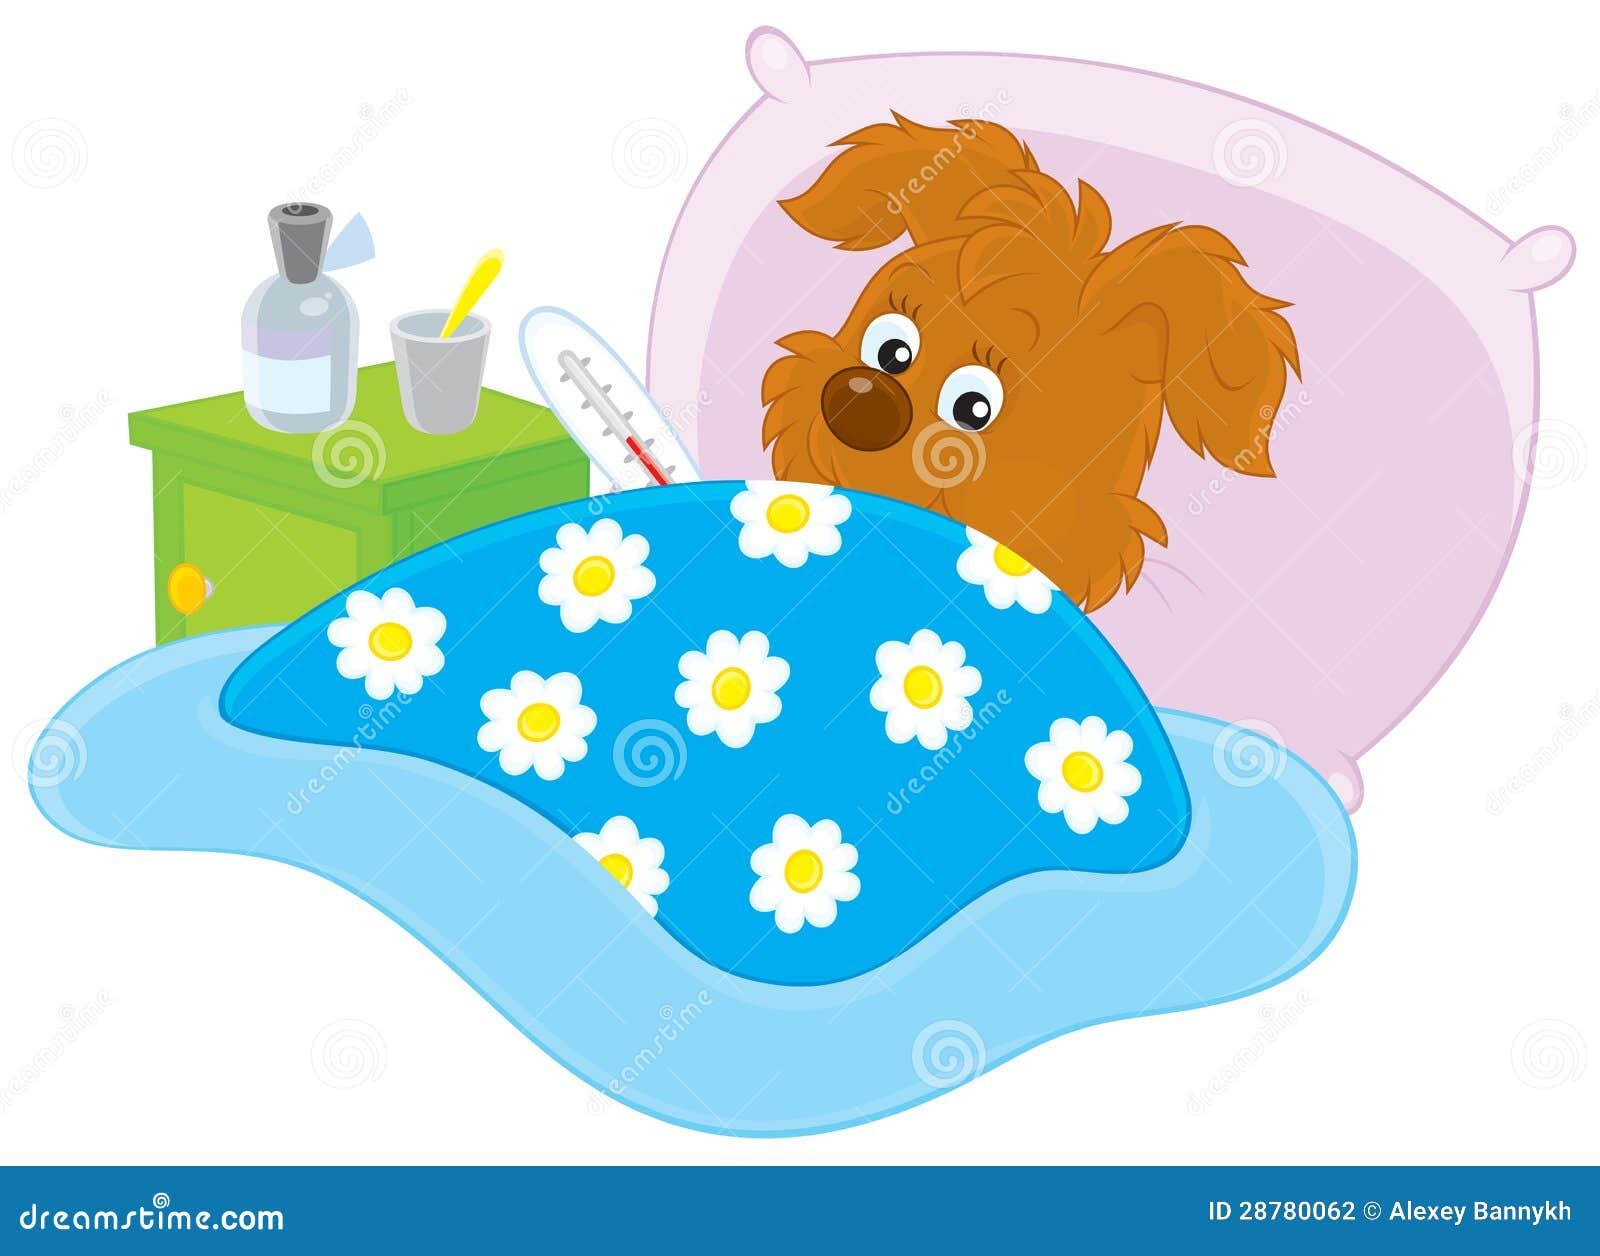 free clipart sick dog - photo #42